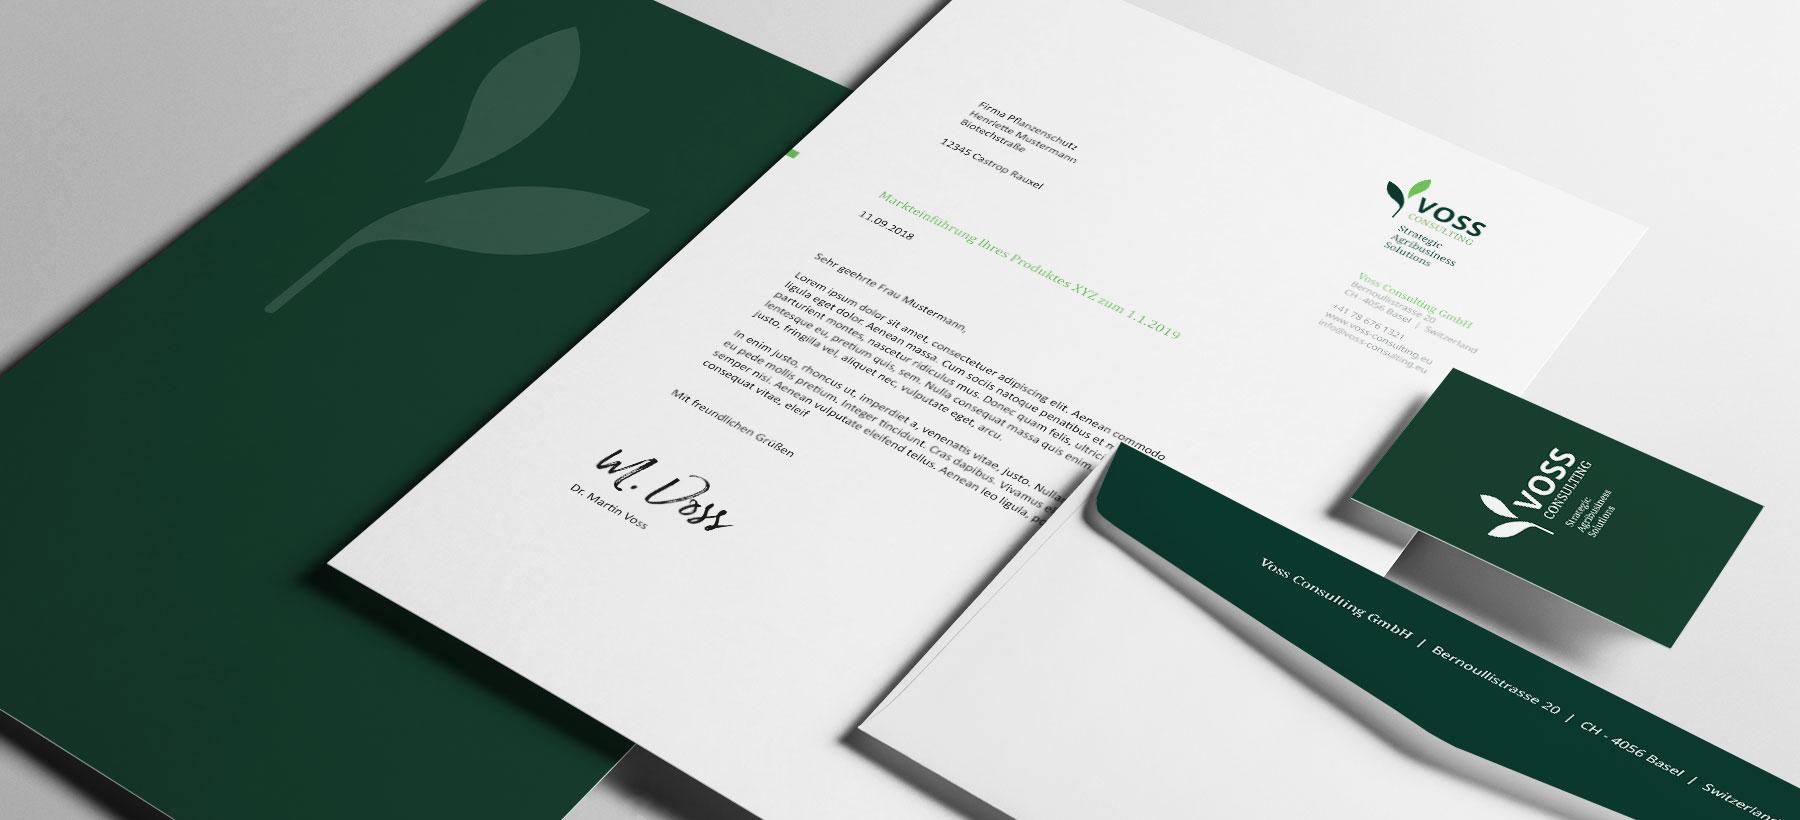 Voss Corporate Design